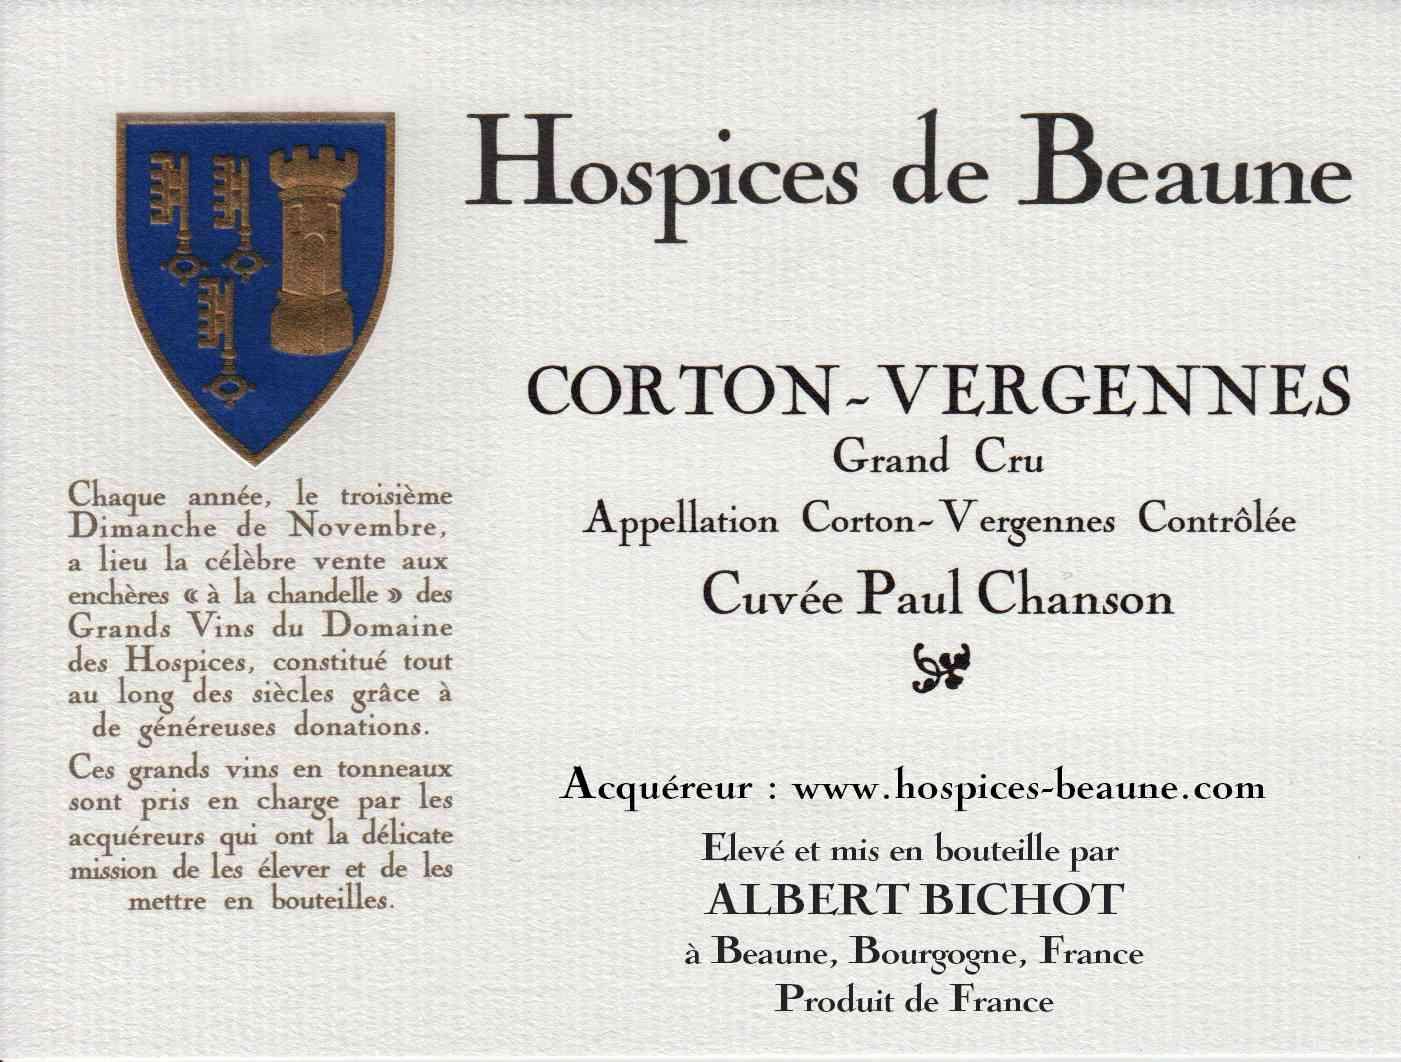 Encheres-auction-HospicesdeBeaune-AlbertBichot-CortonVergennes-GrandCru-Cuvee-PaulChanson